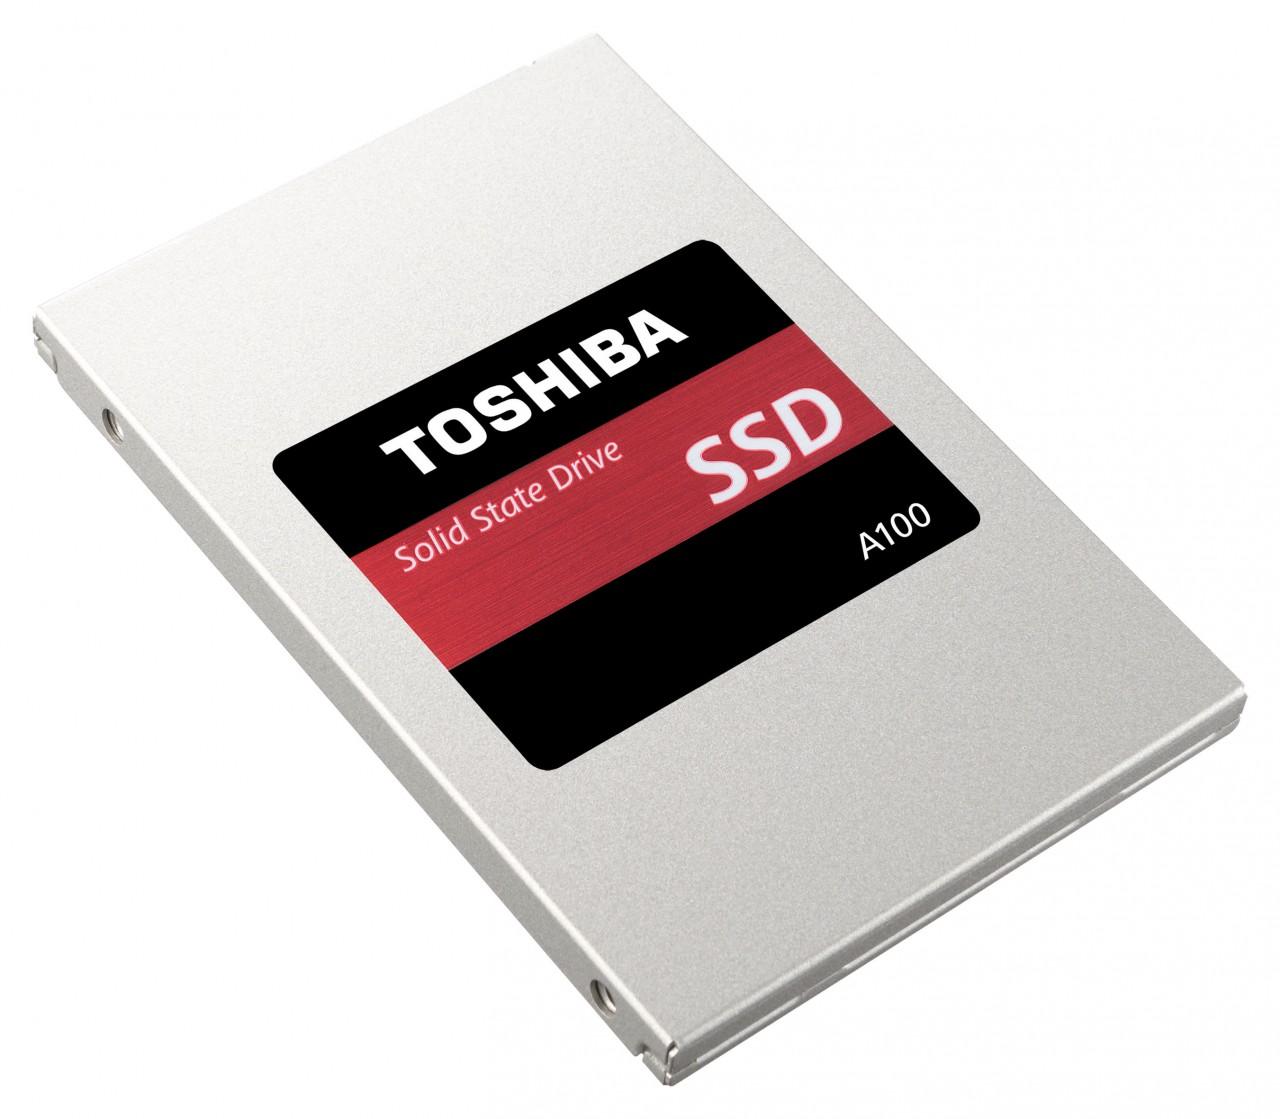 Toshiba_SSD_A100_02